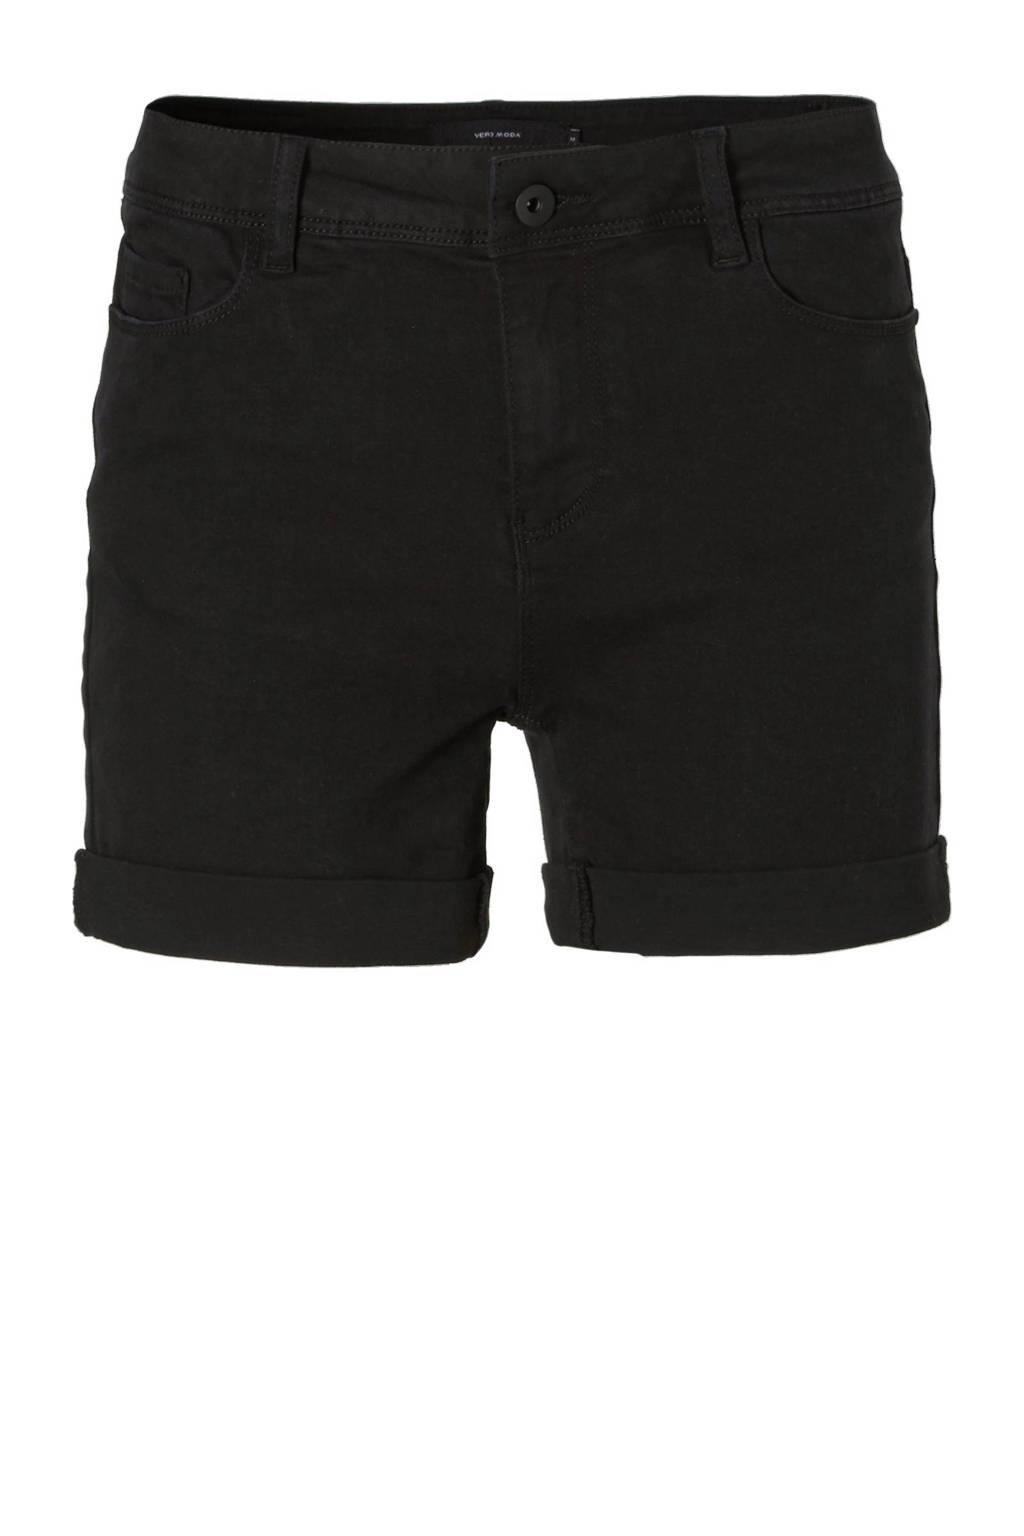 VERO MODA regular waist slim fit jeans short, Zwart